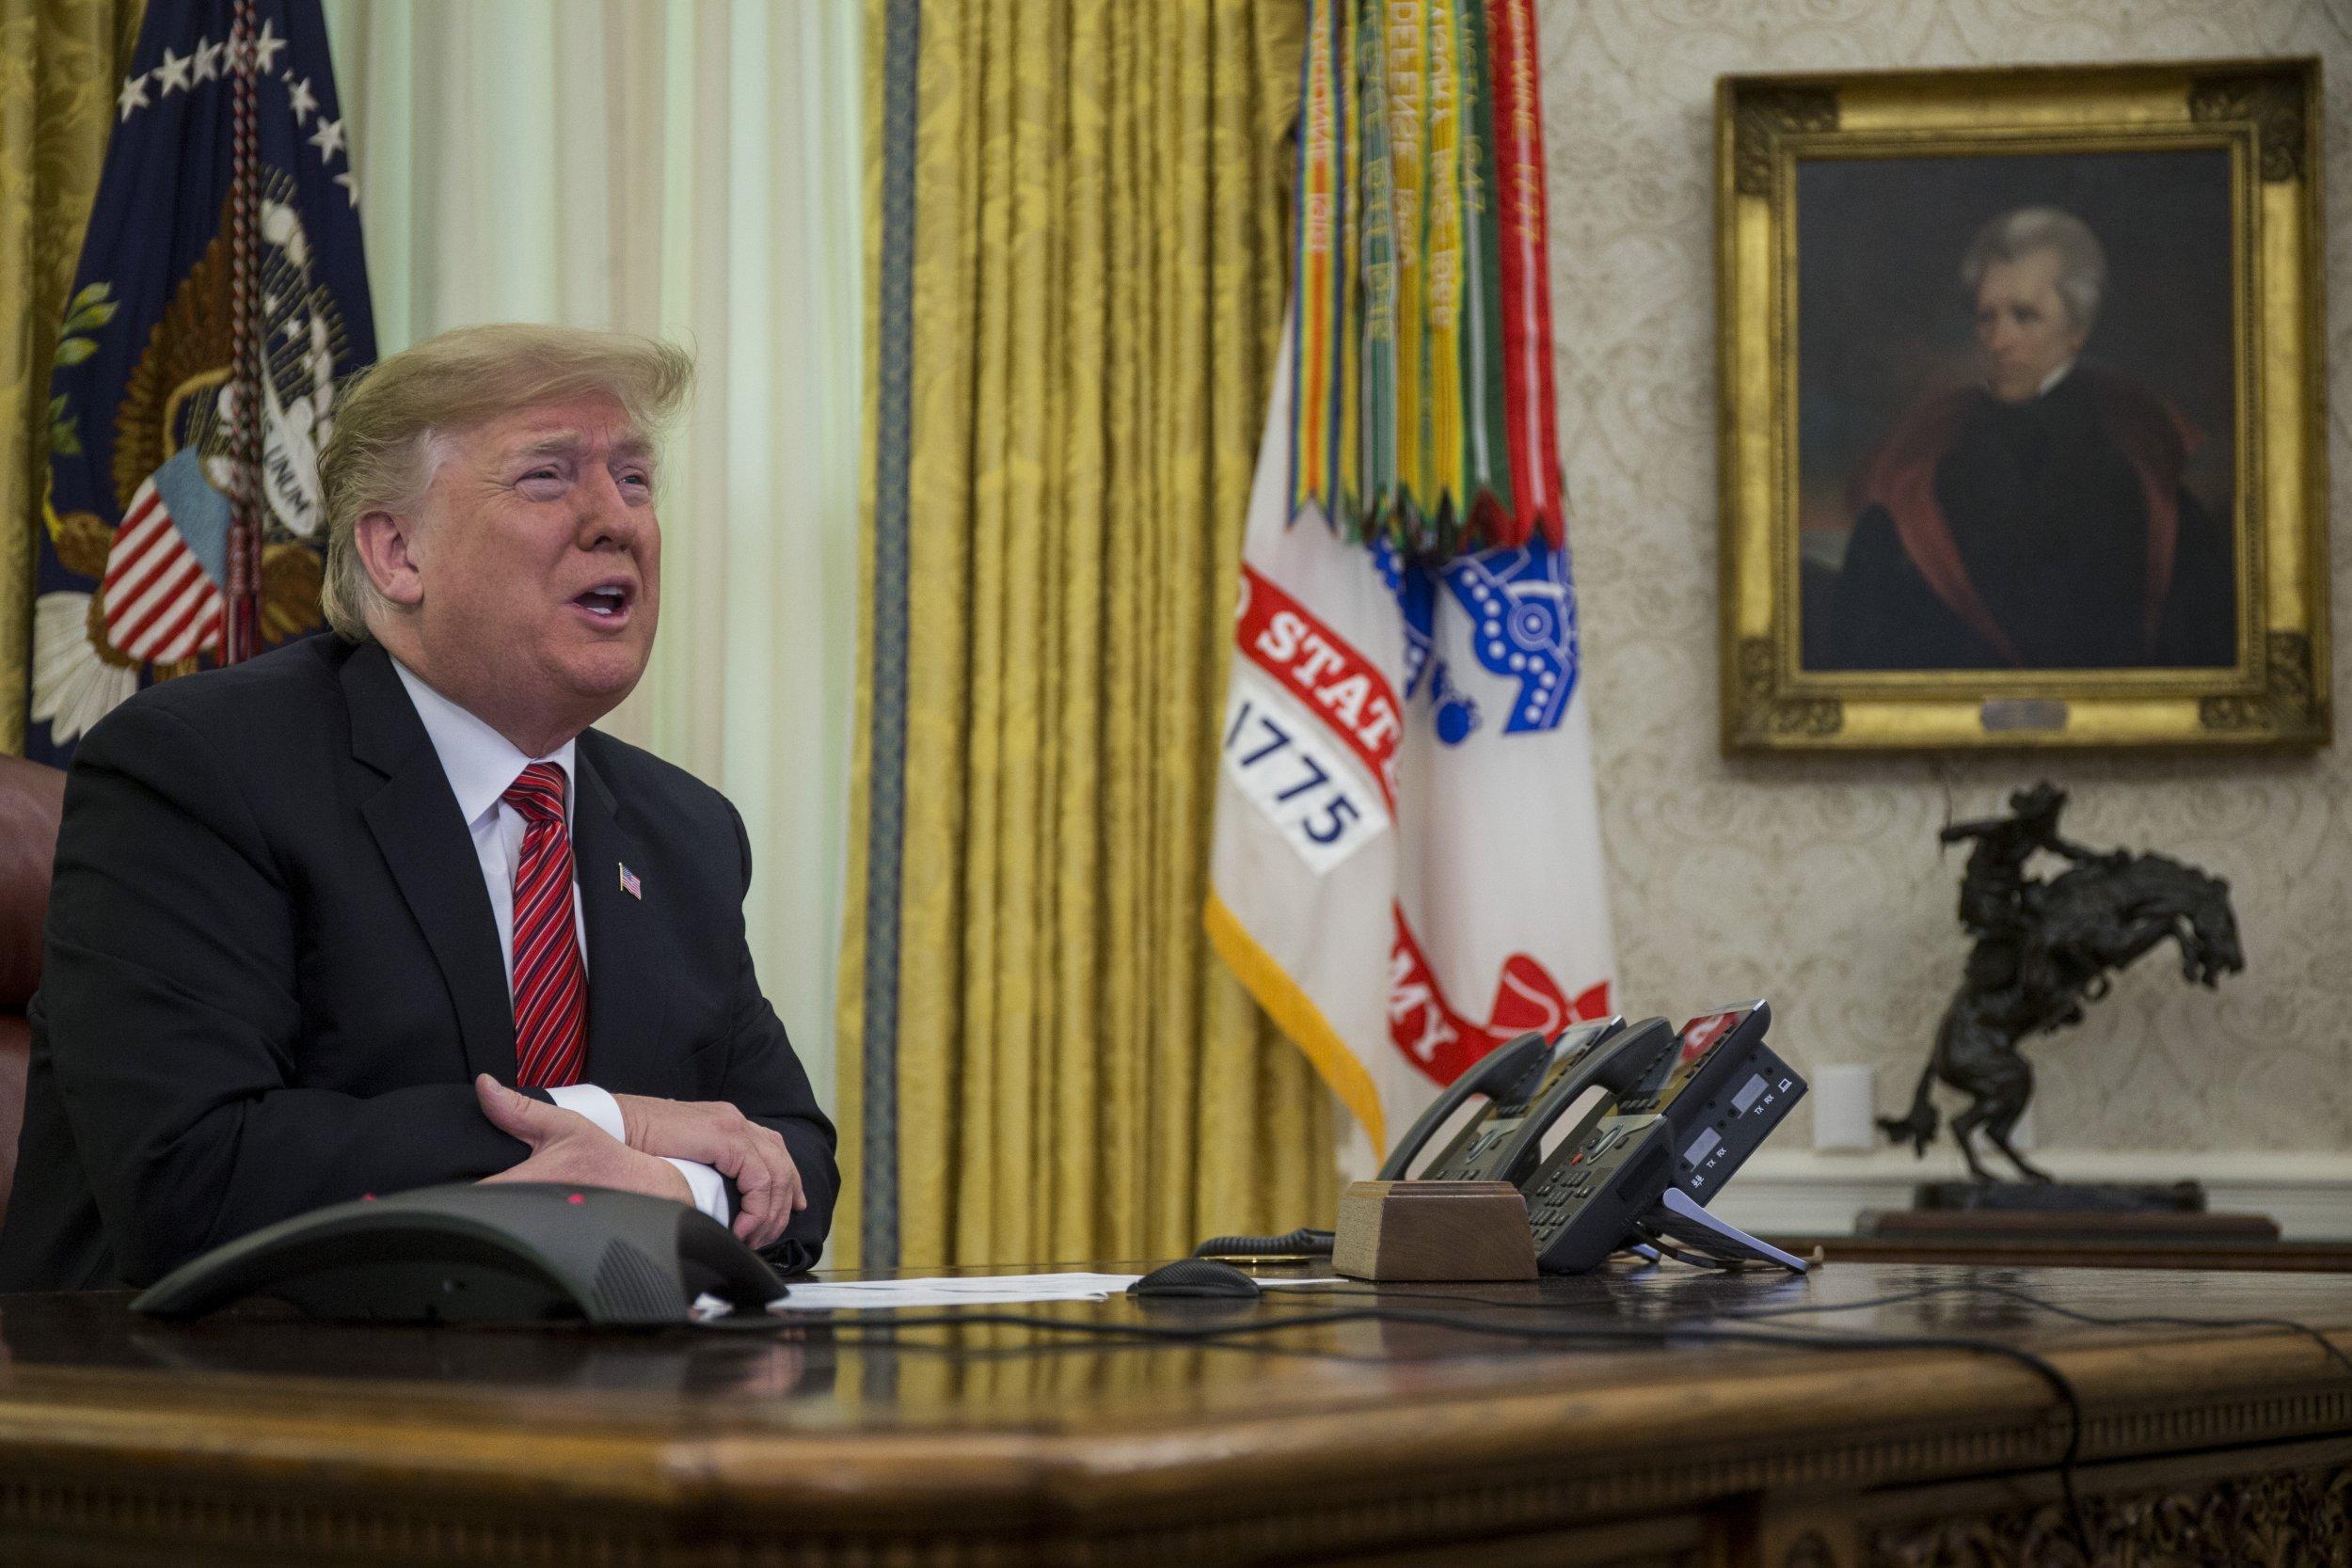 donald trump, worst president, joe scarborough